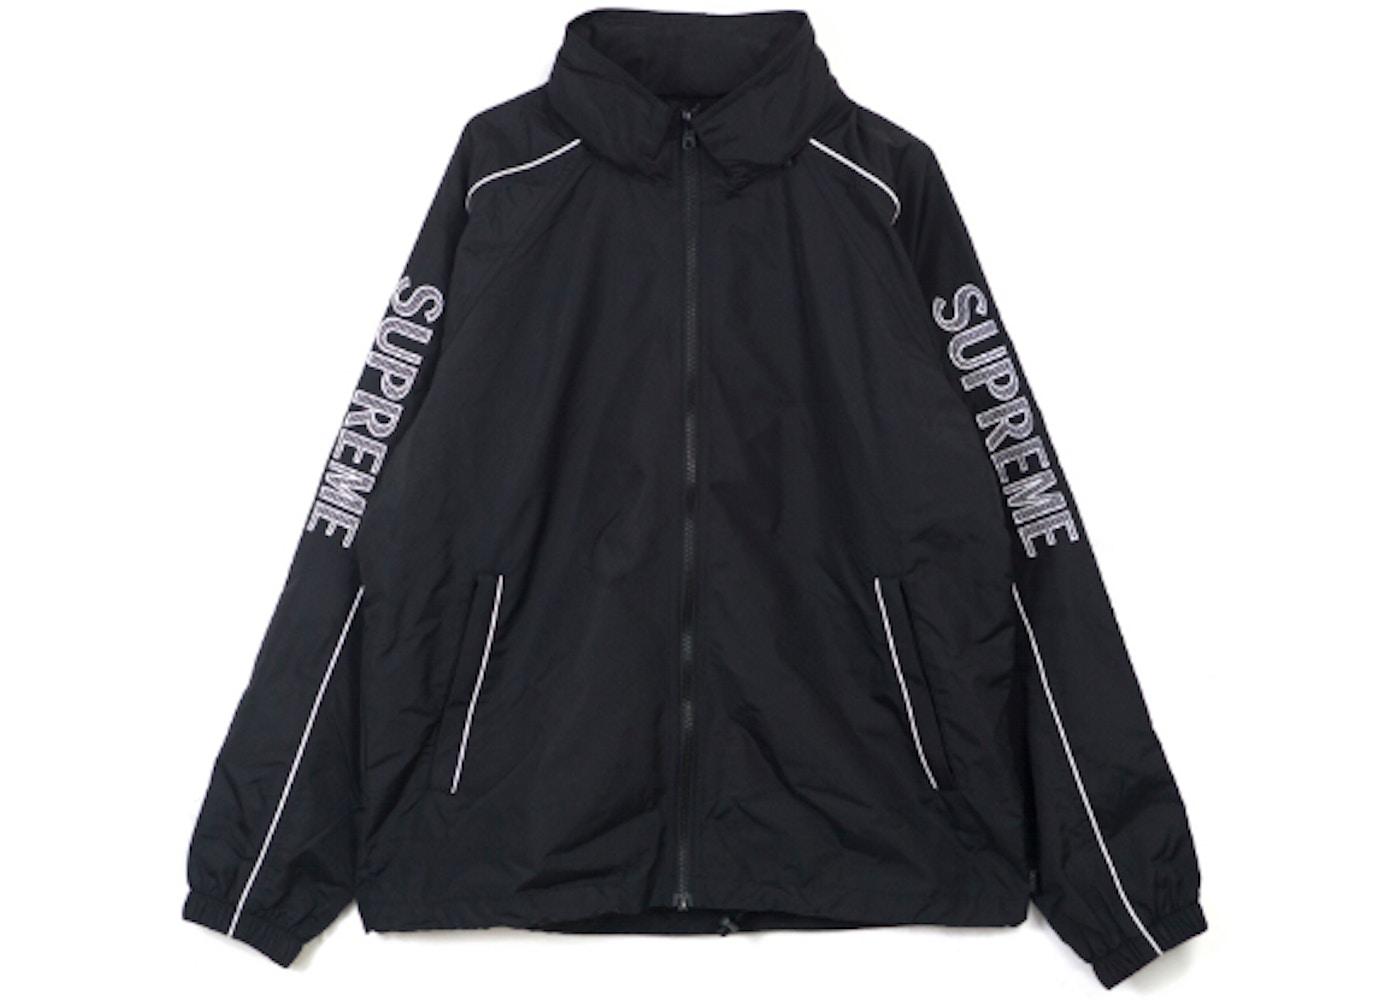 sale retailer 7b188 db996 Supreme Striped Logo Windbreaker Black - SS17